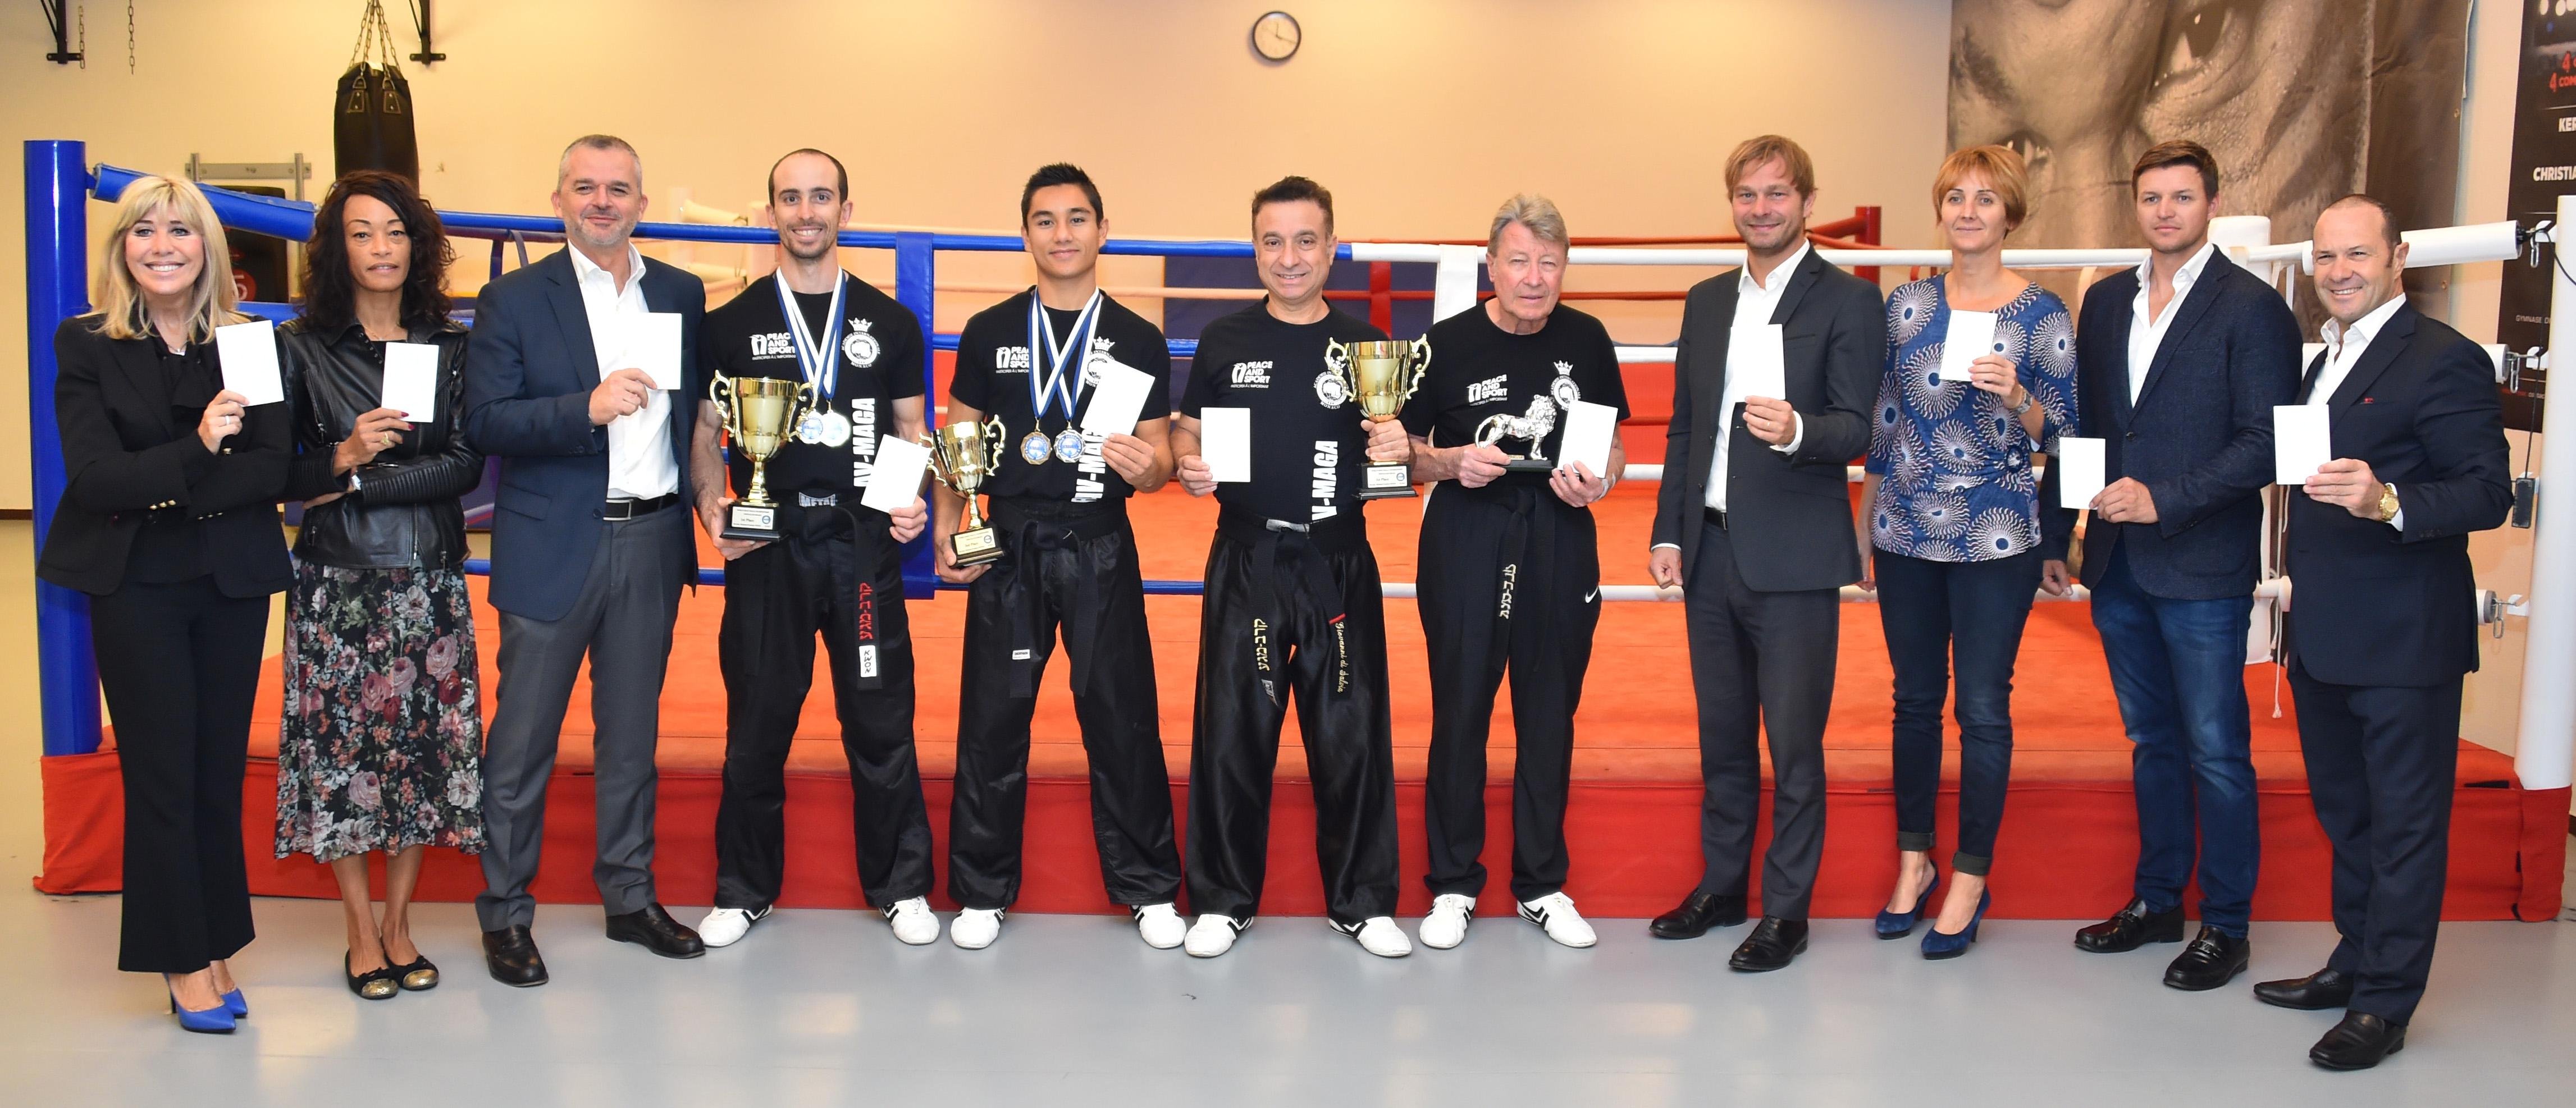 Lequipe championne du monde de Krav Maga a lhonneur a Monaco